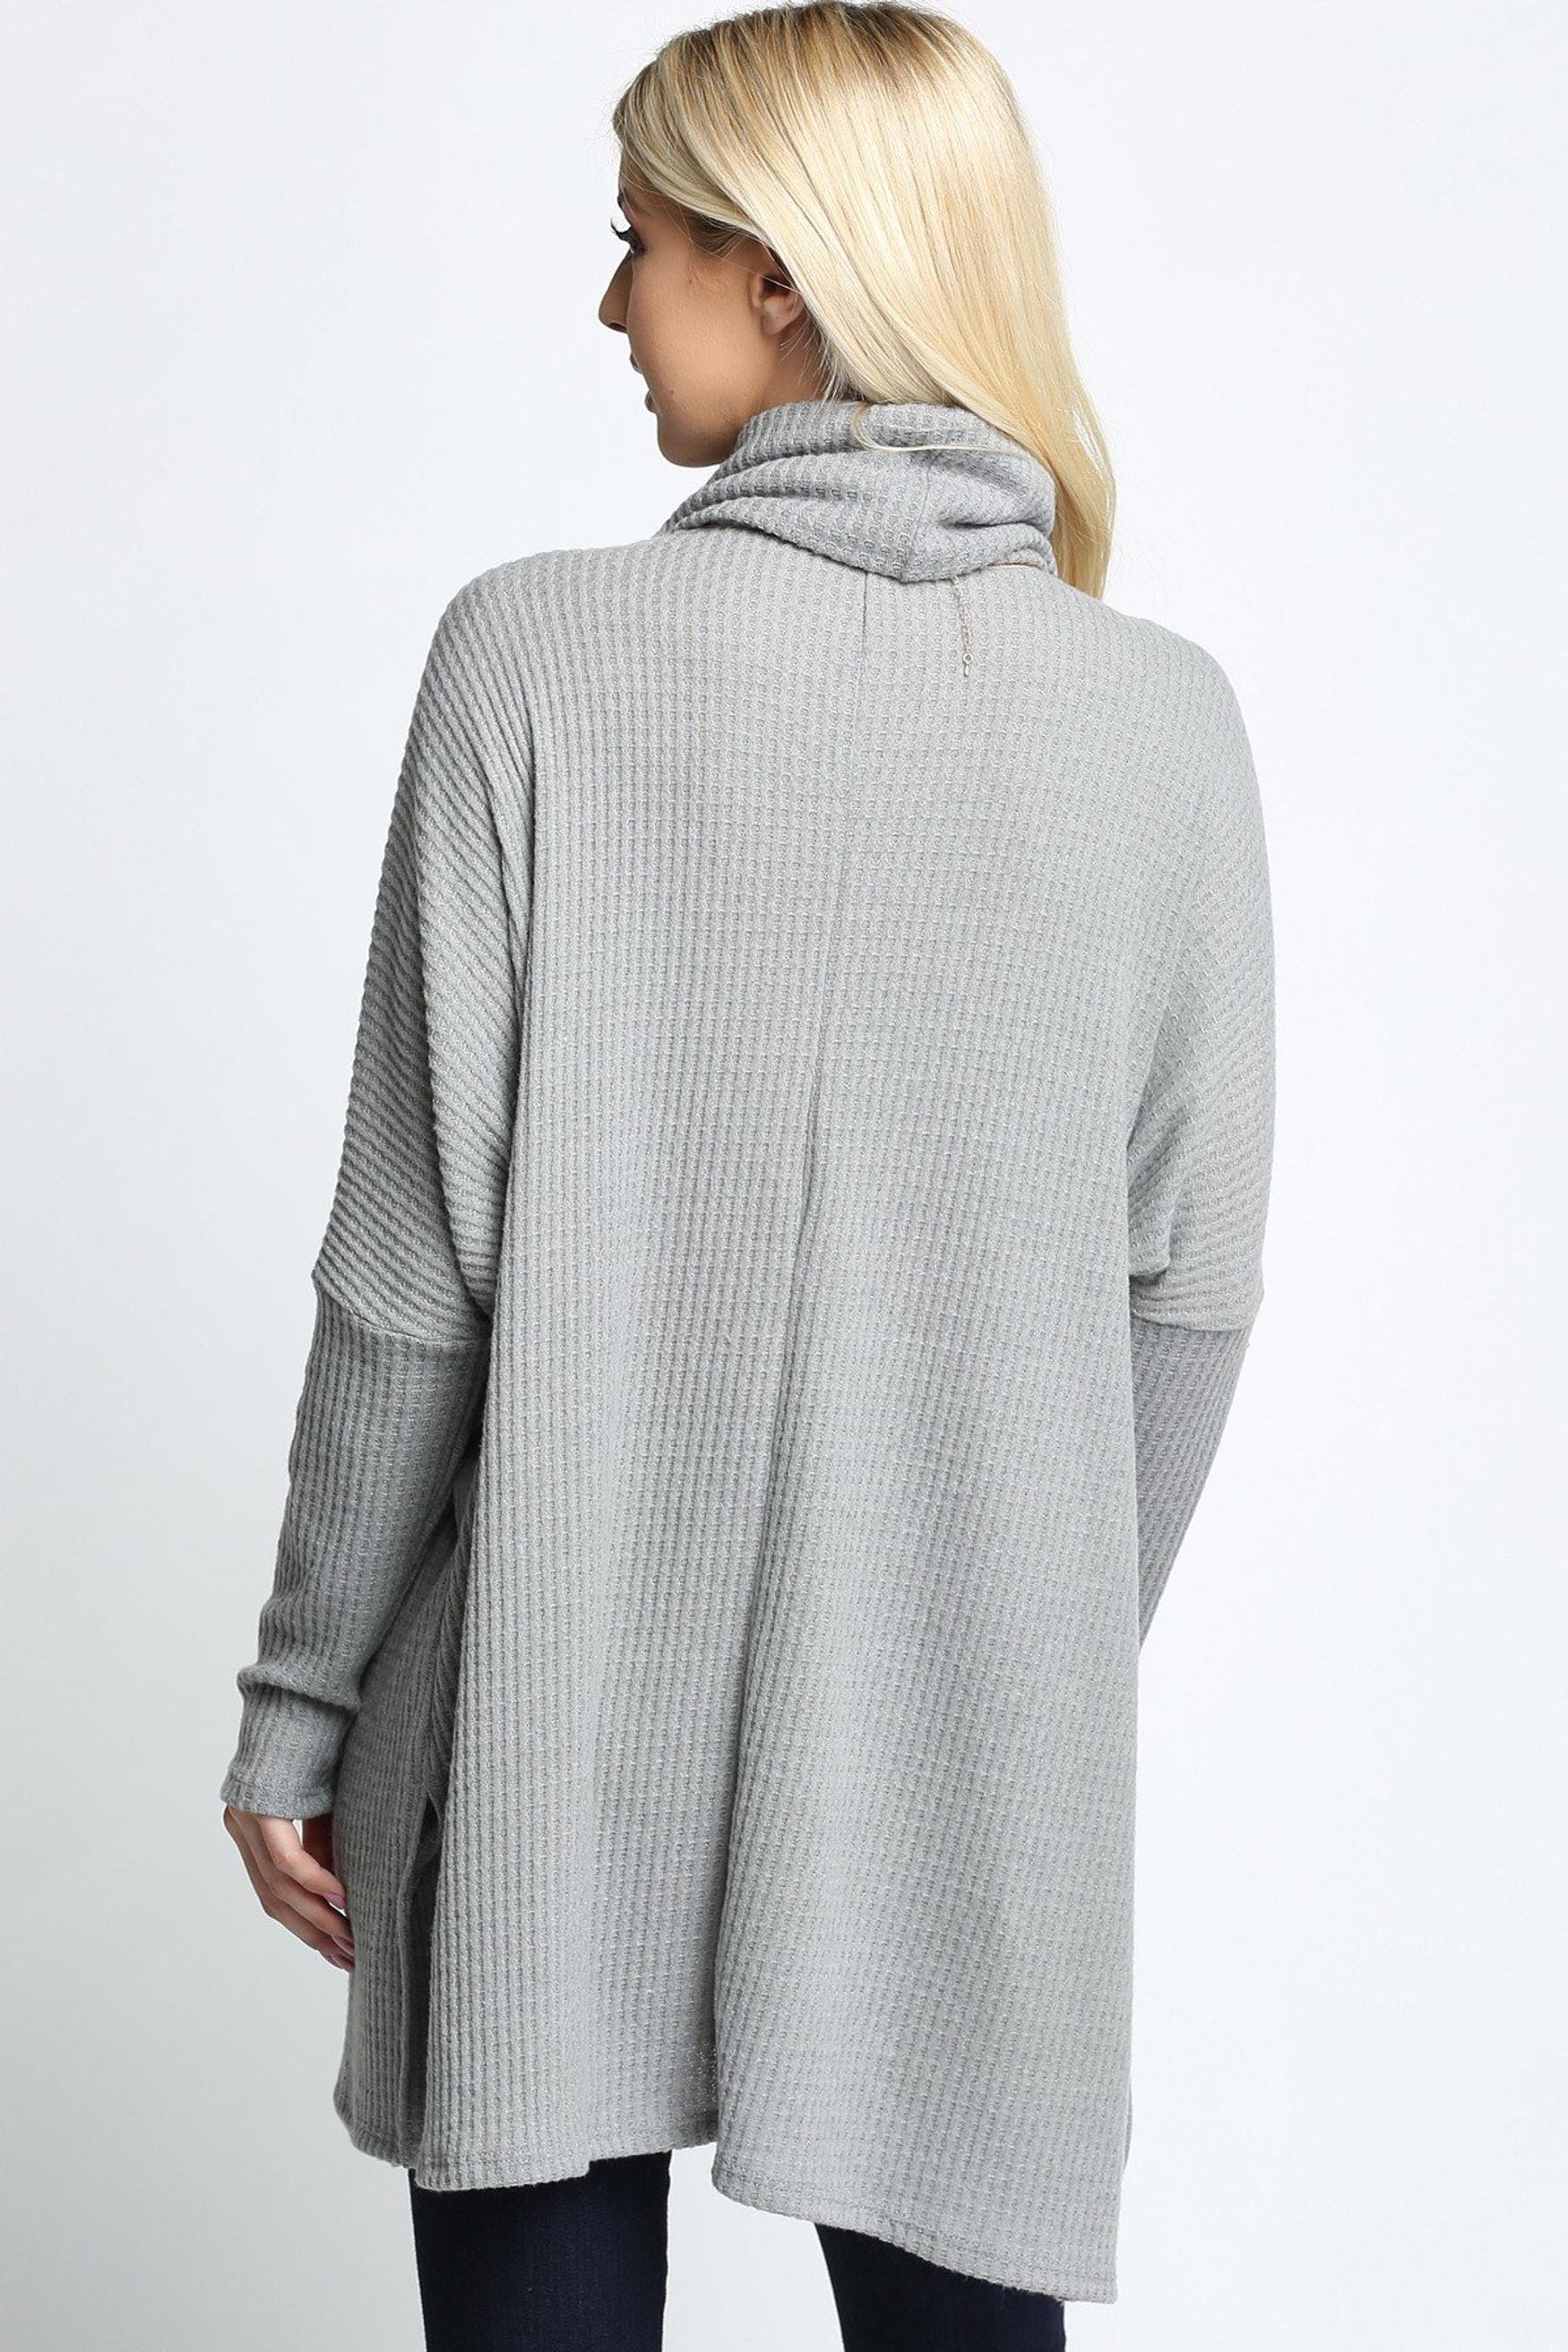 Grey Waffle Knit Cowl Neck Dolman Sleeve Top